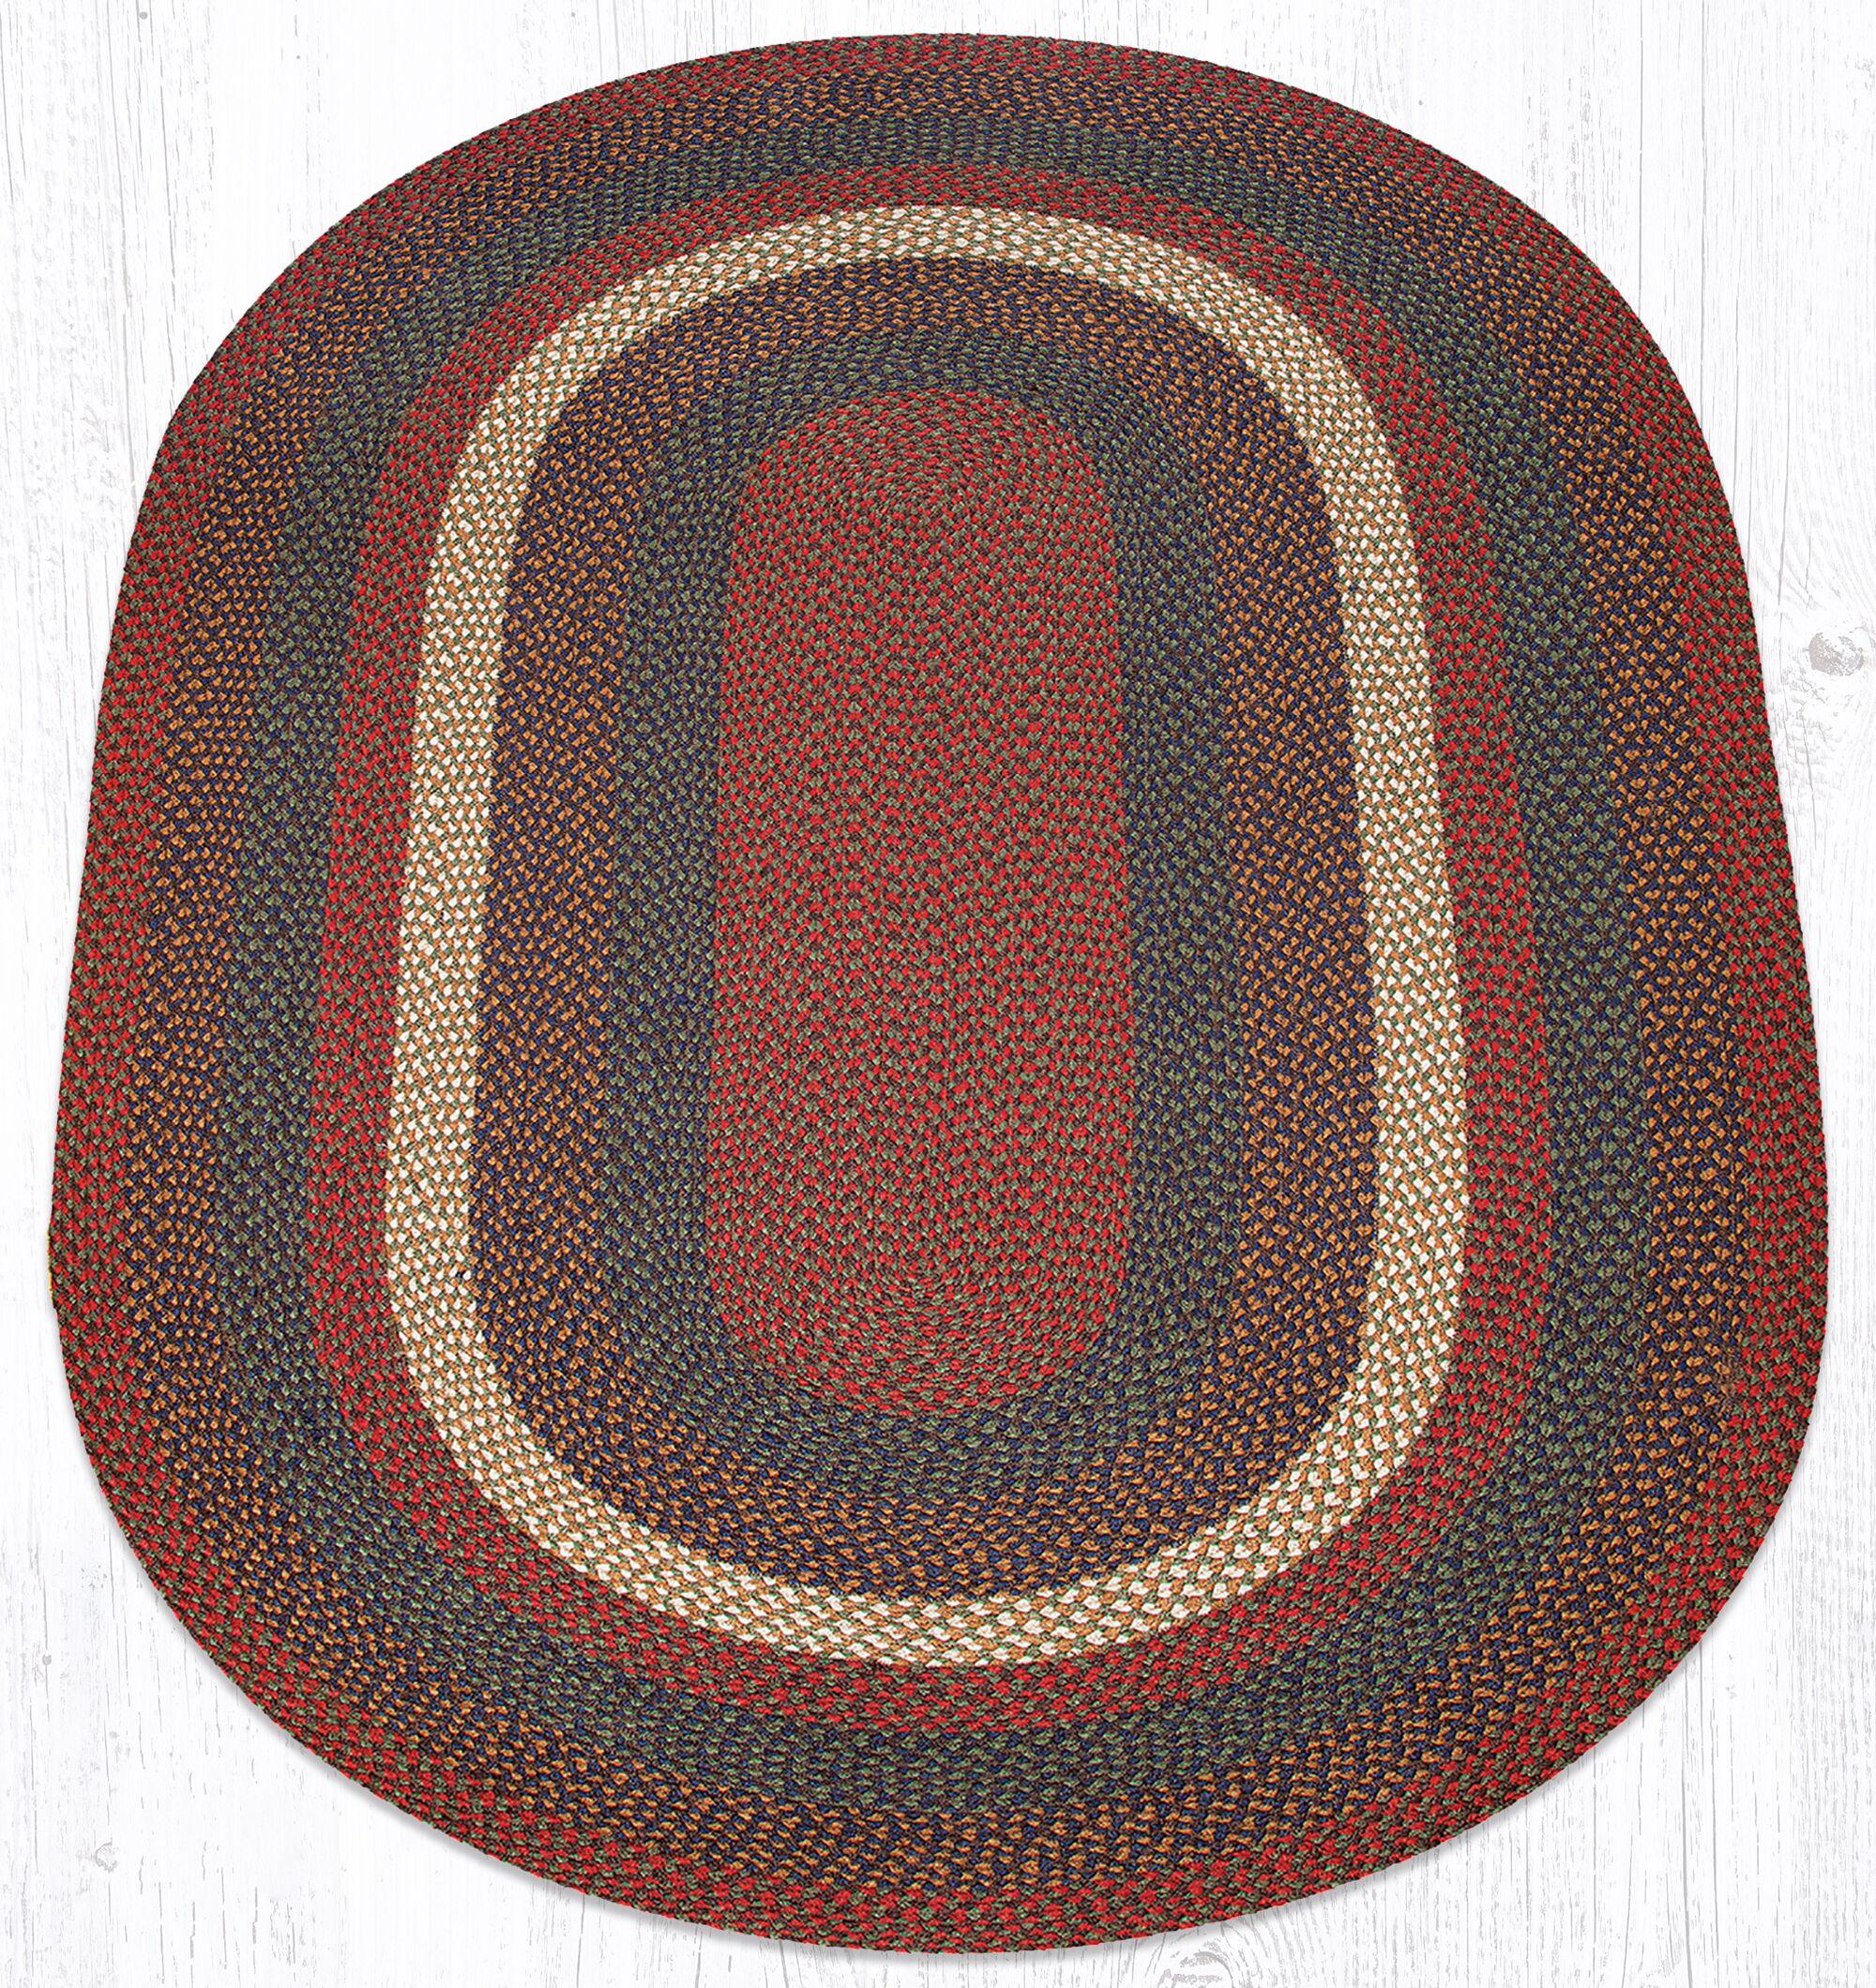 Burgundy/Gray Braided Area Rug Rug Size: Oval 5' x 8'